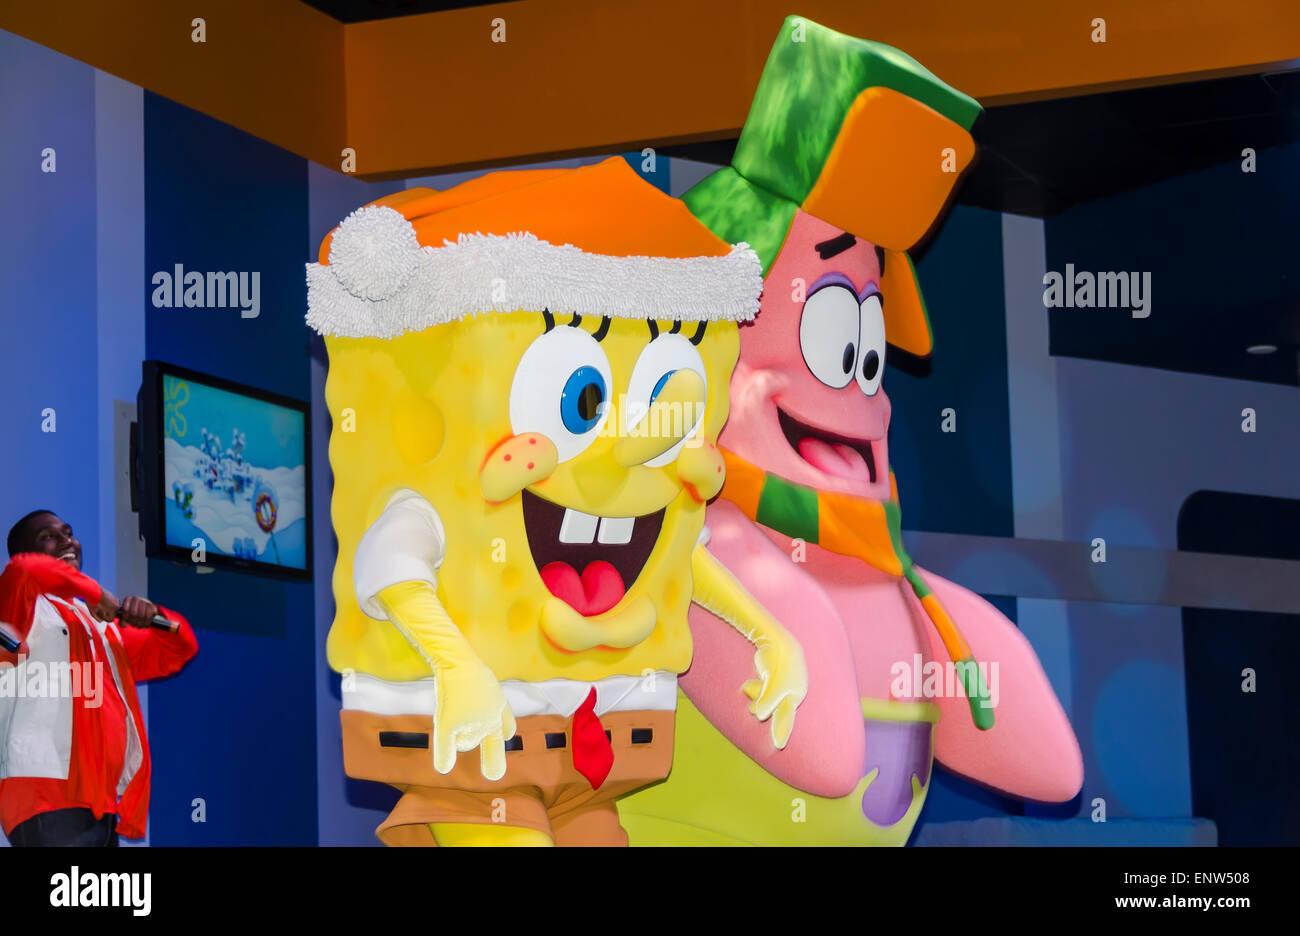 Spongebob Squarepants Und Patrick Star Cartoon Charaktere Bühne